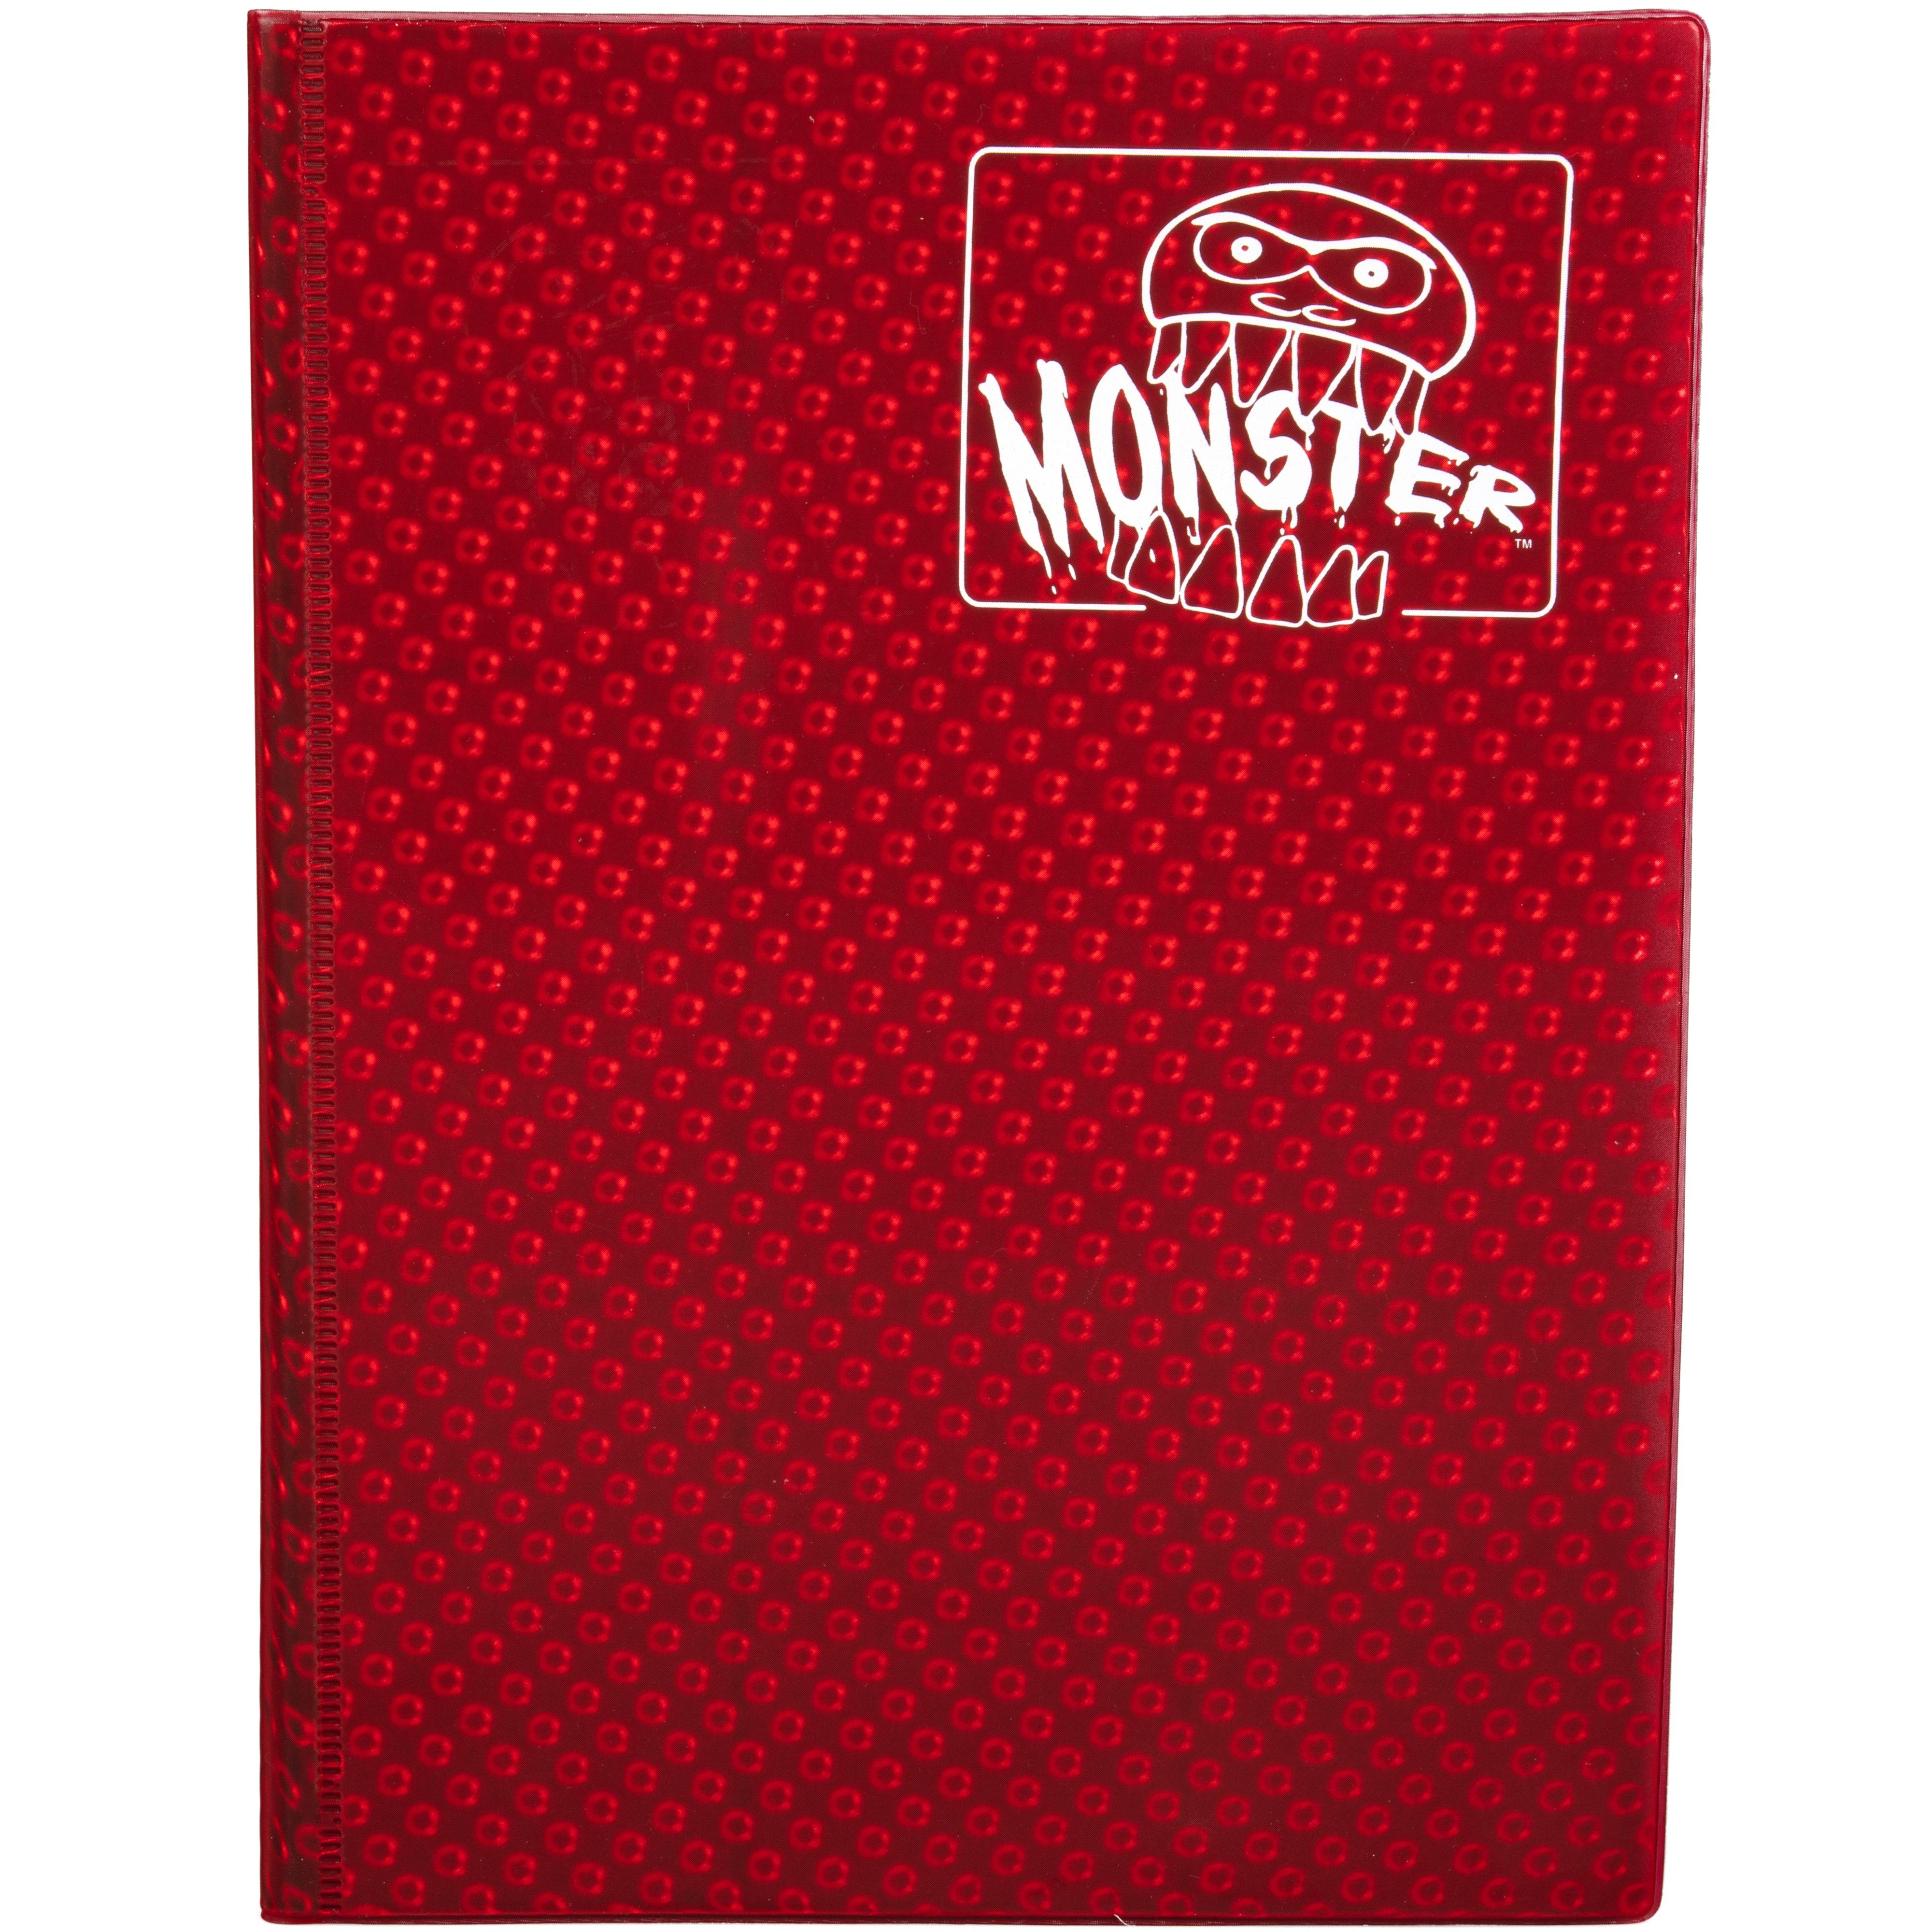 Monster Trading Card Album: 4 Pocket Binder Holofoil Red Game Box